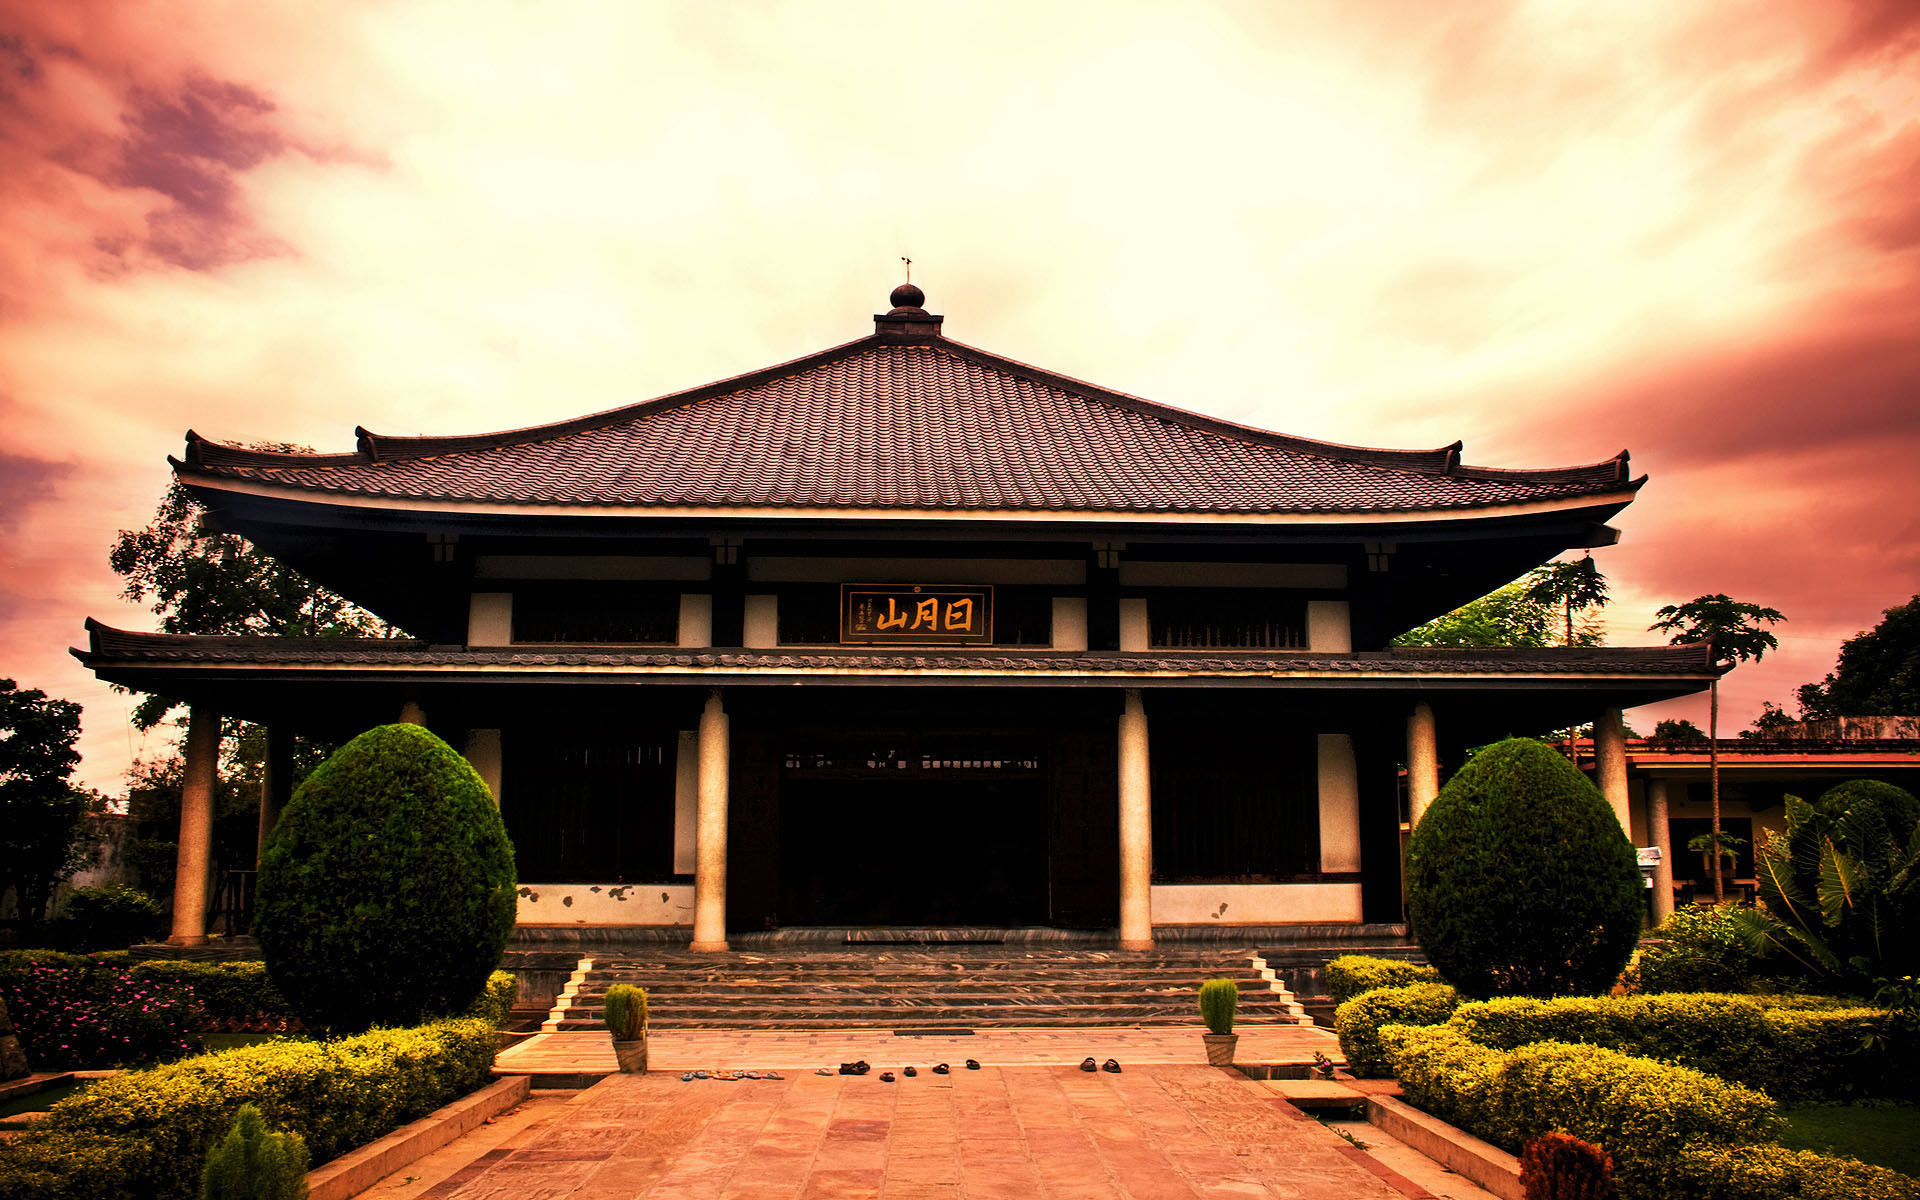 Japanese House Scenery Background HD Desktop Wallpaper, Background Image